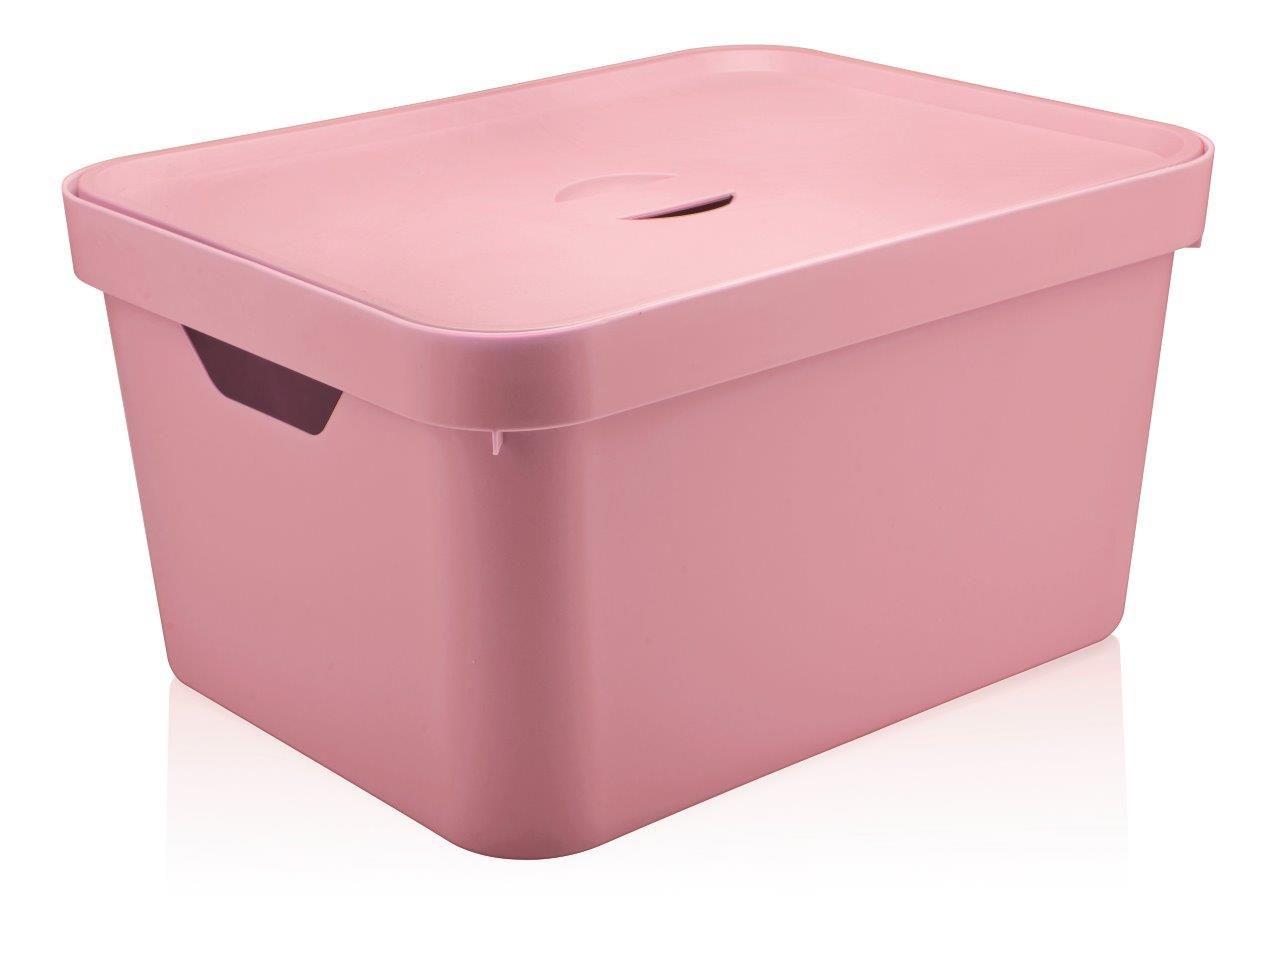 Caixa Organizadora Cube G Com Tampa 32L Rosa Quartz - Ou